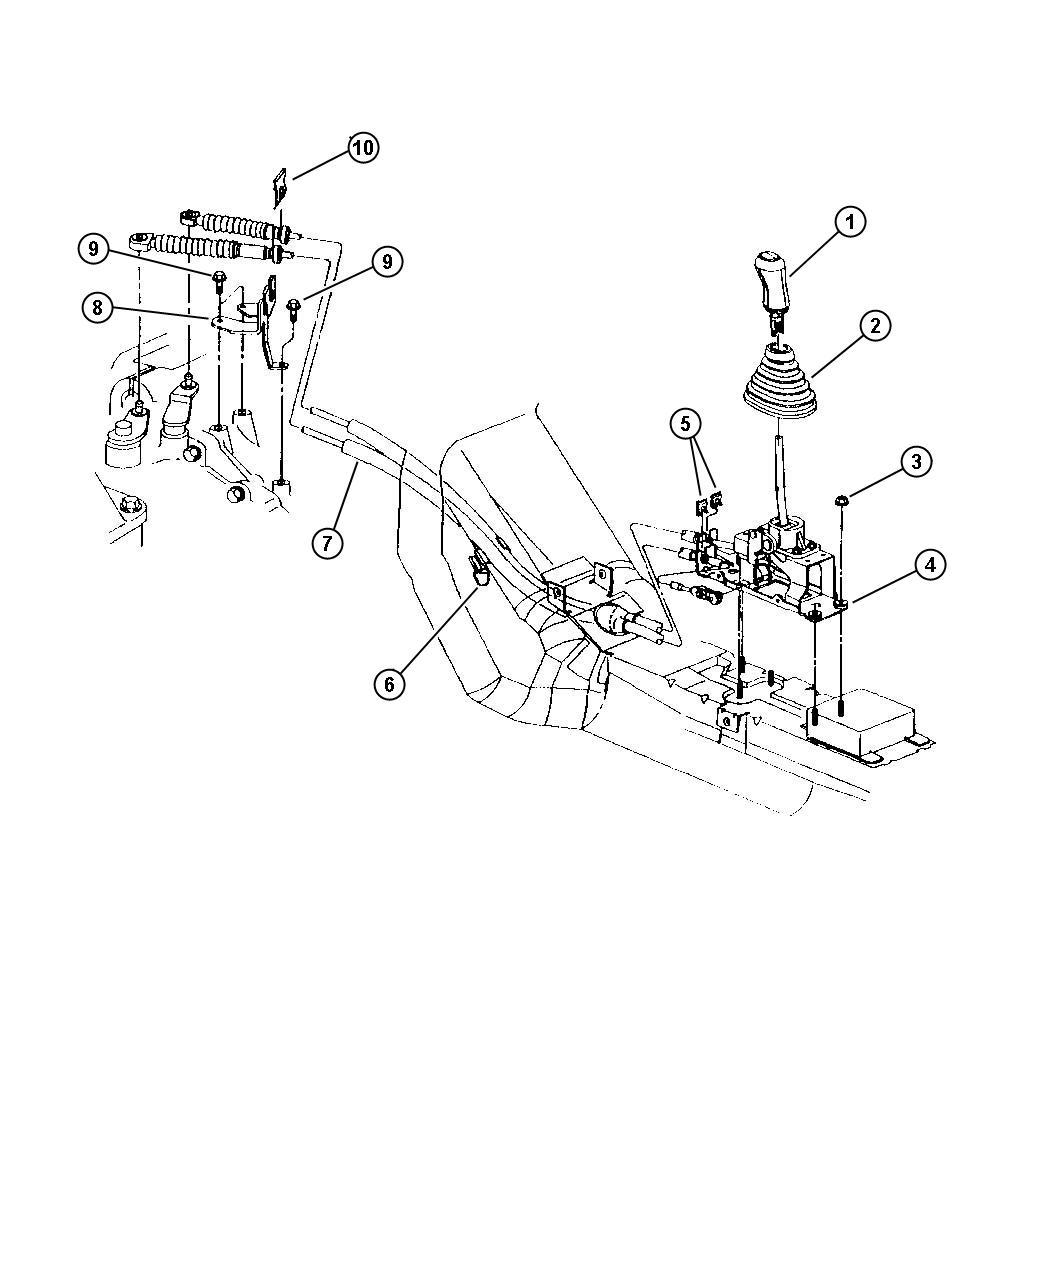 Chrysler Cirrus Boot. Gear shift lever. American